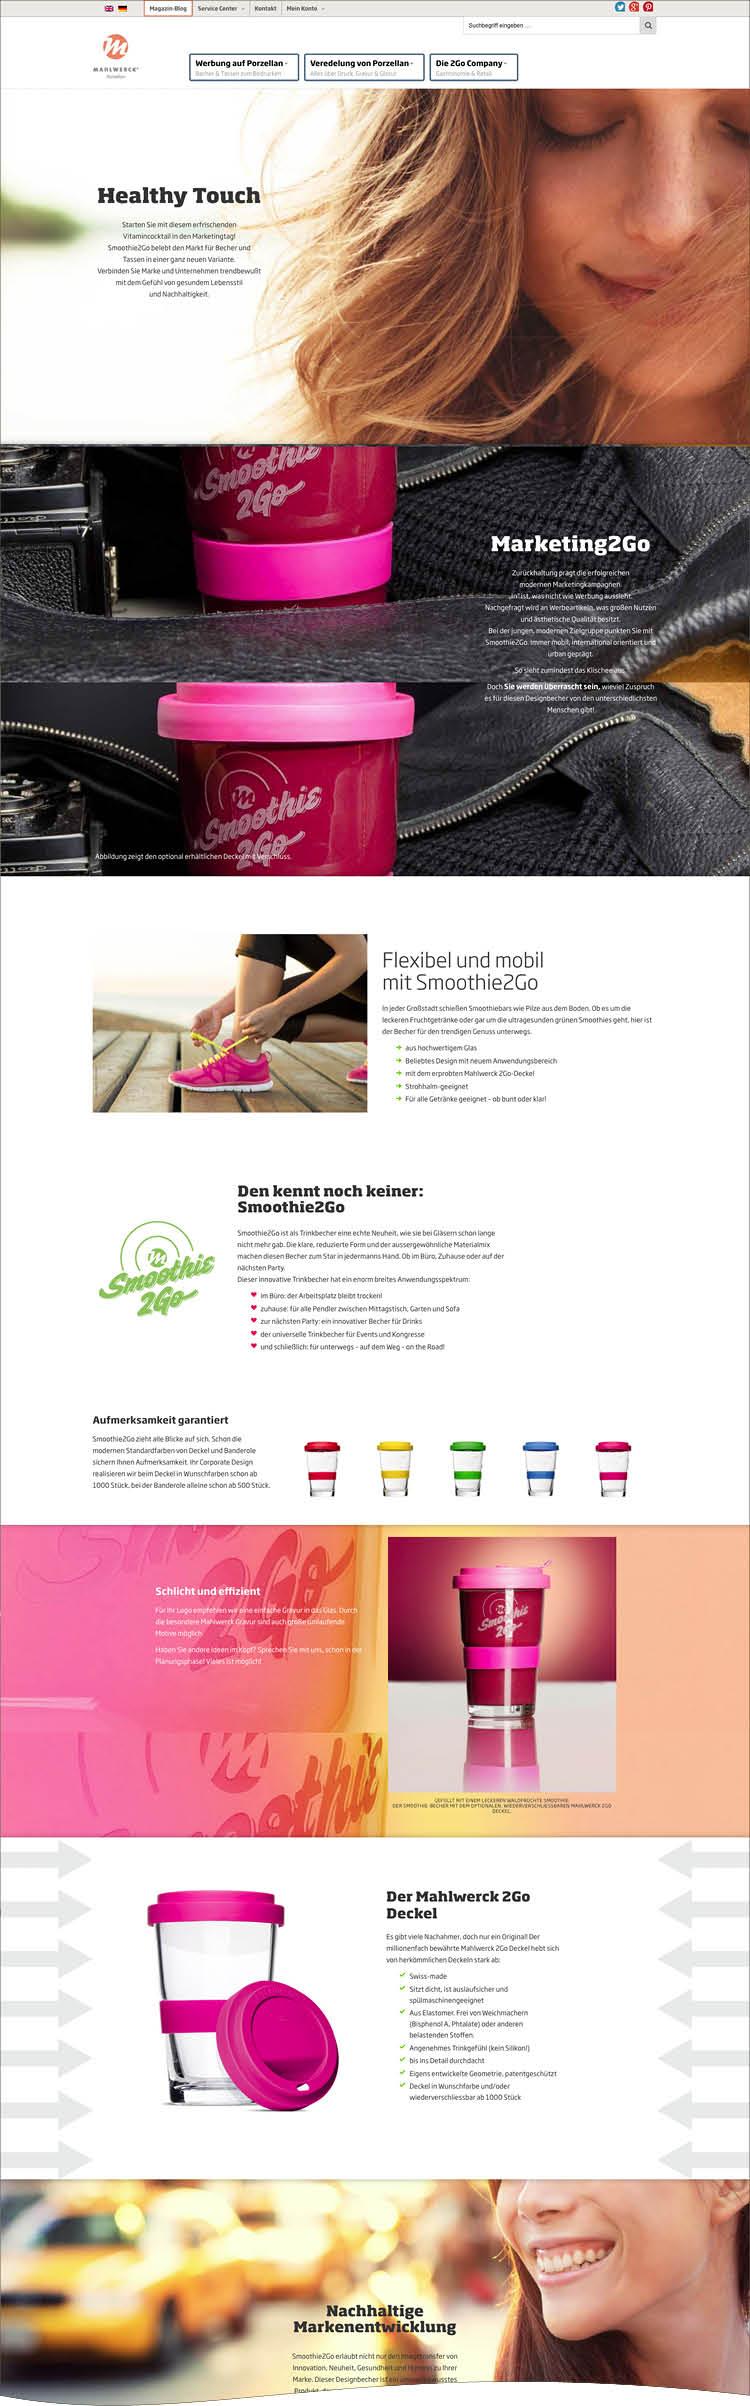 Das Product Special für Smoothie to Go - Mahlwerck Website